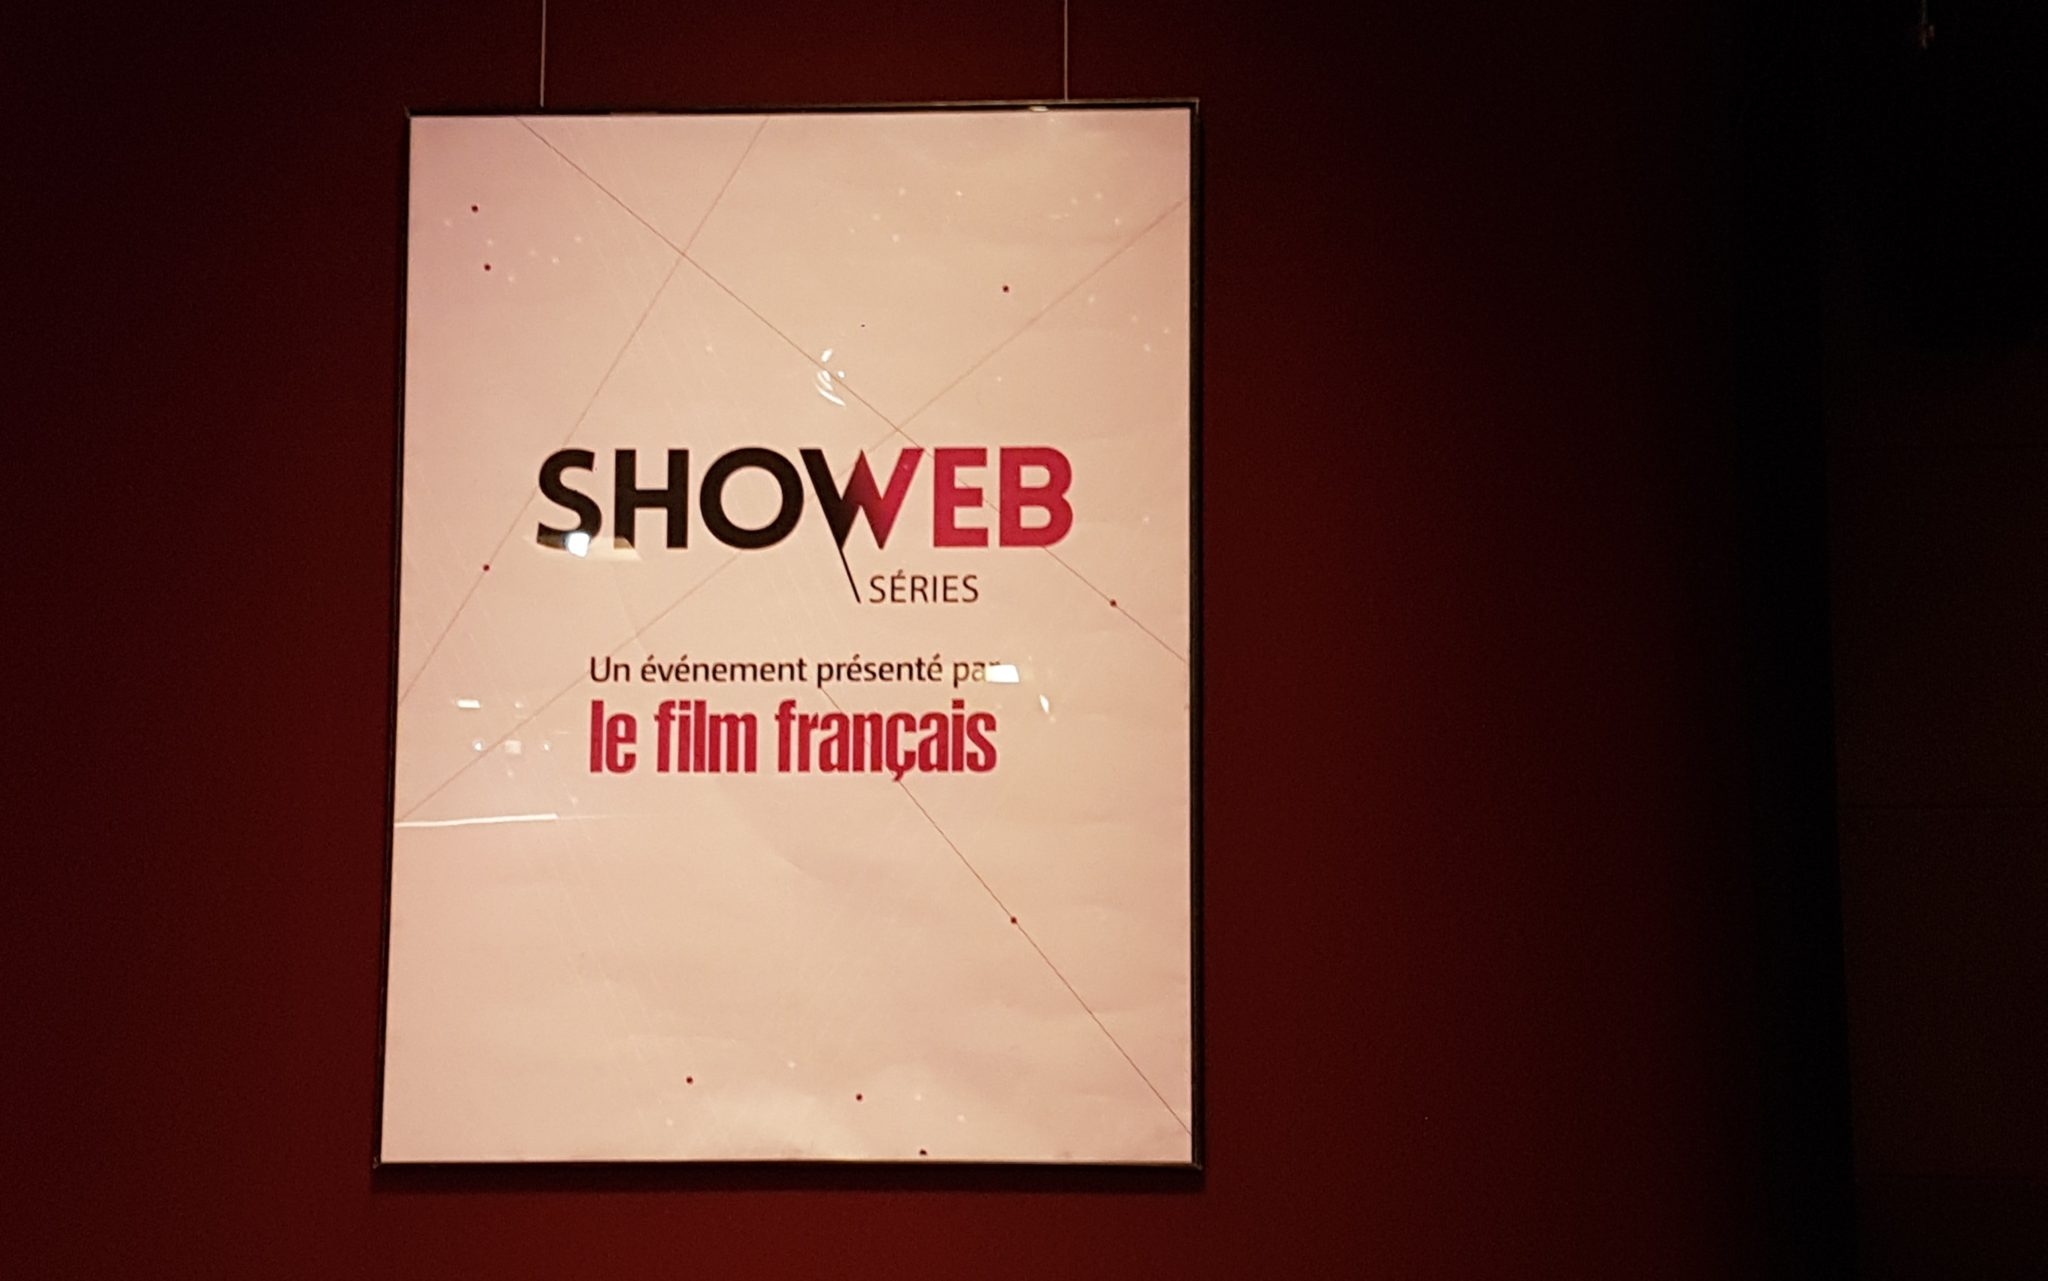 Showeb Séries 2018 image